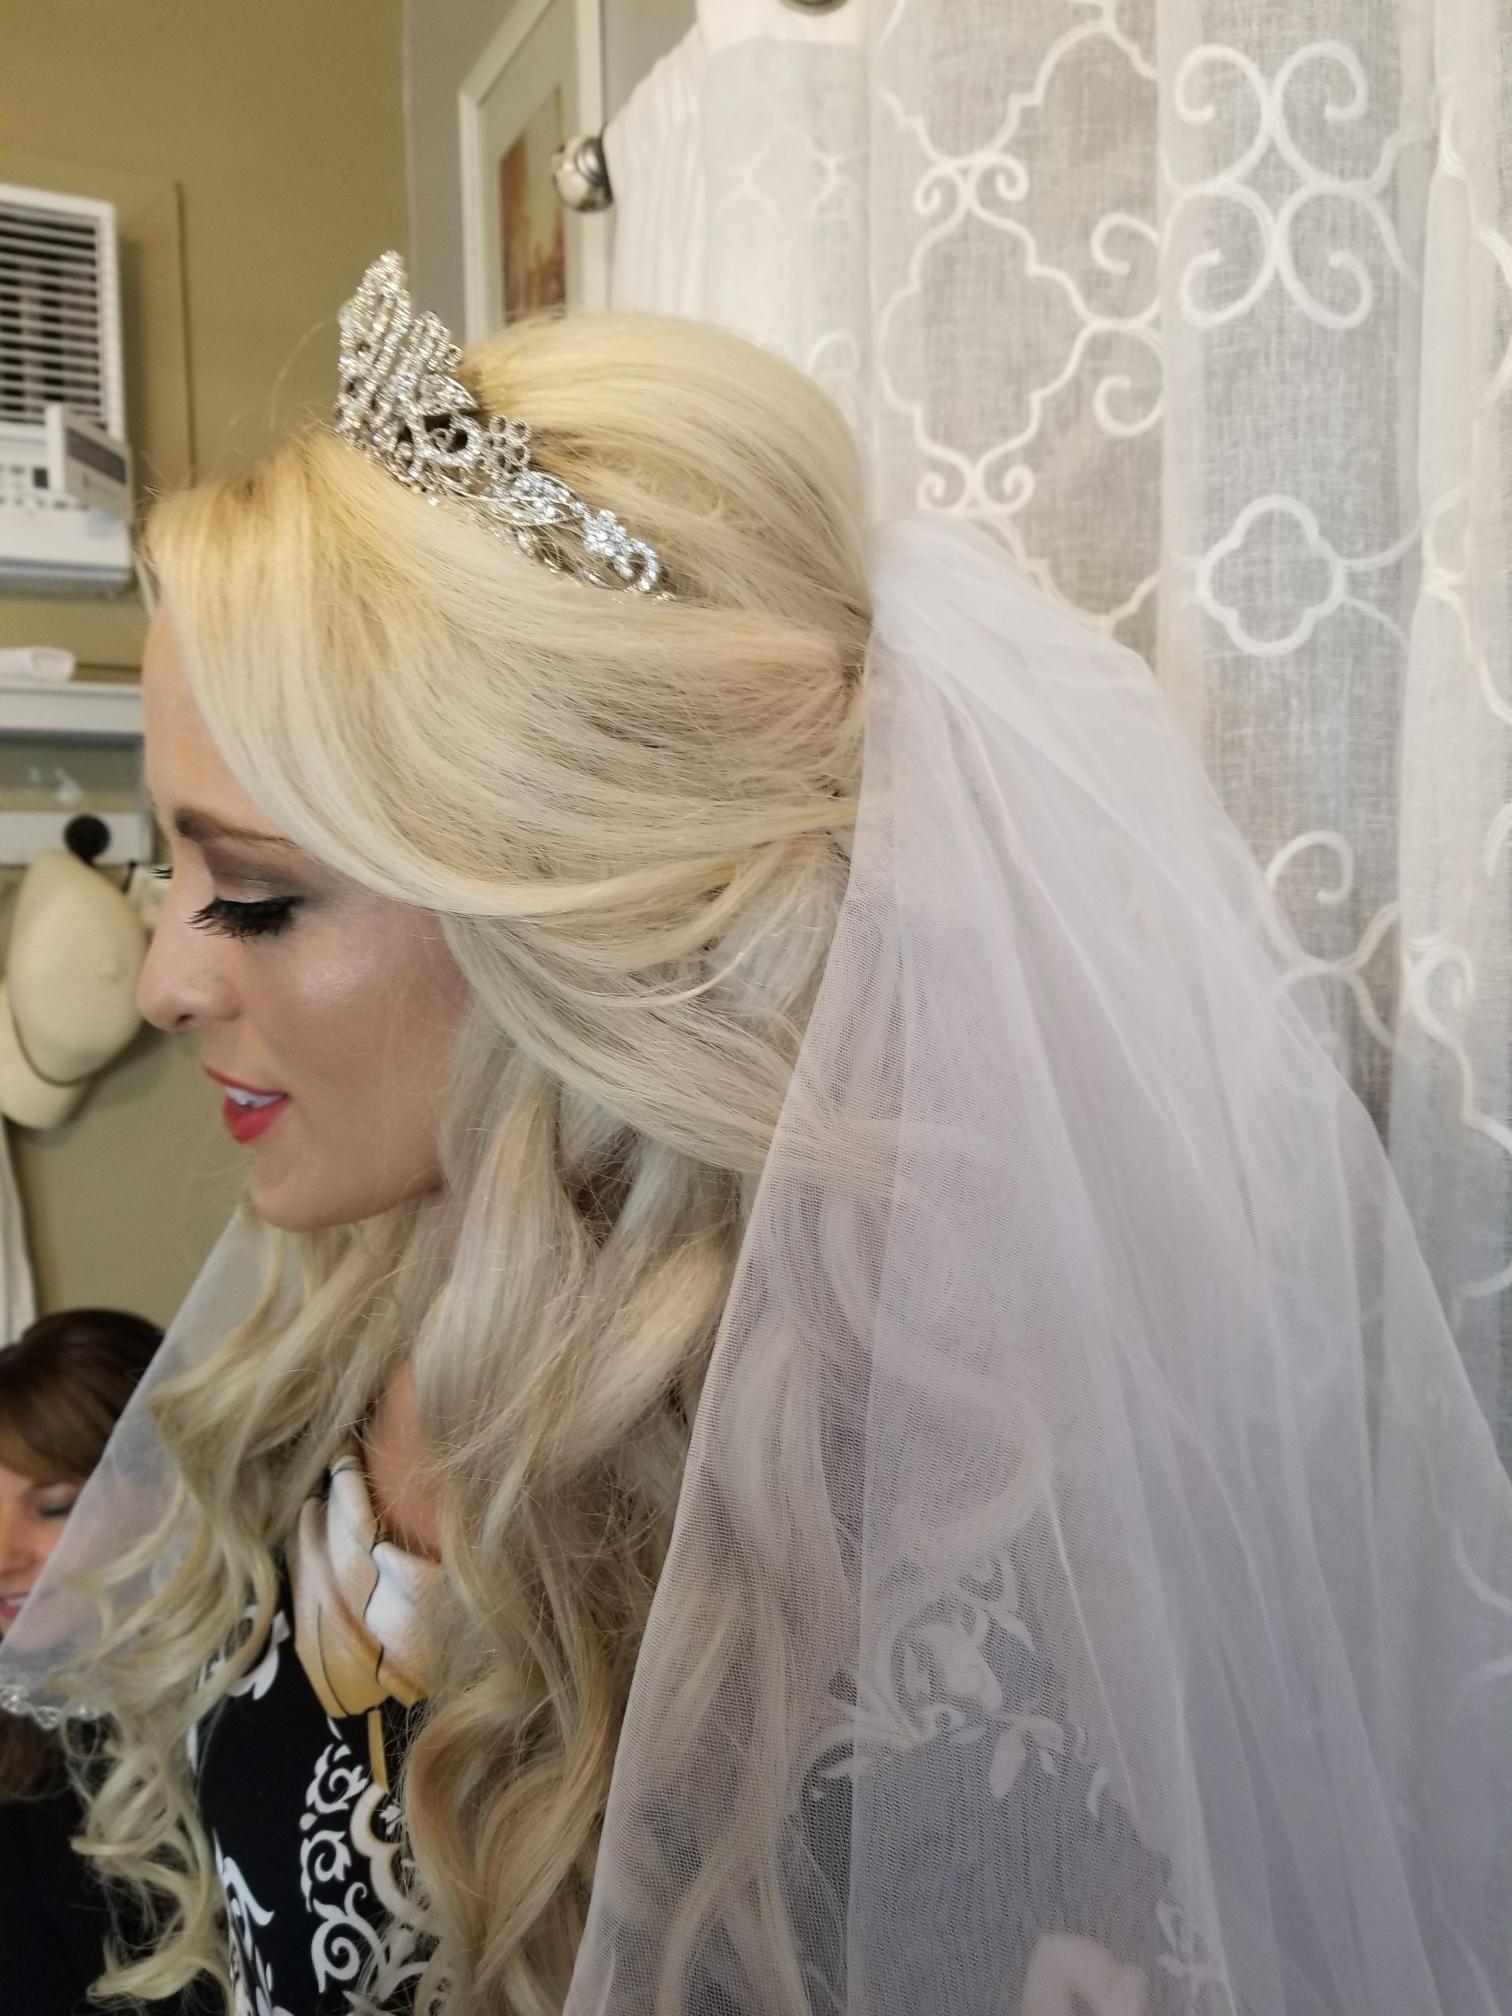 Soft Flowing Beach Waves With Tiara Beautiful Wedding Hair Wedding Tiara Hairstyles Bridal Hair And Makeup